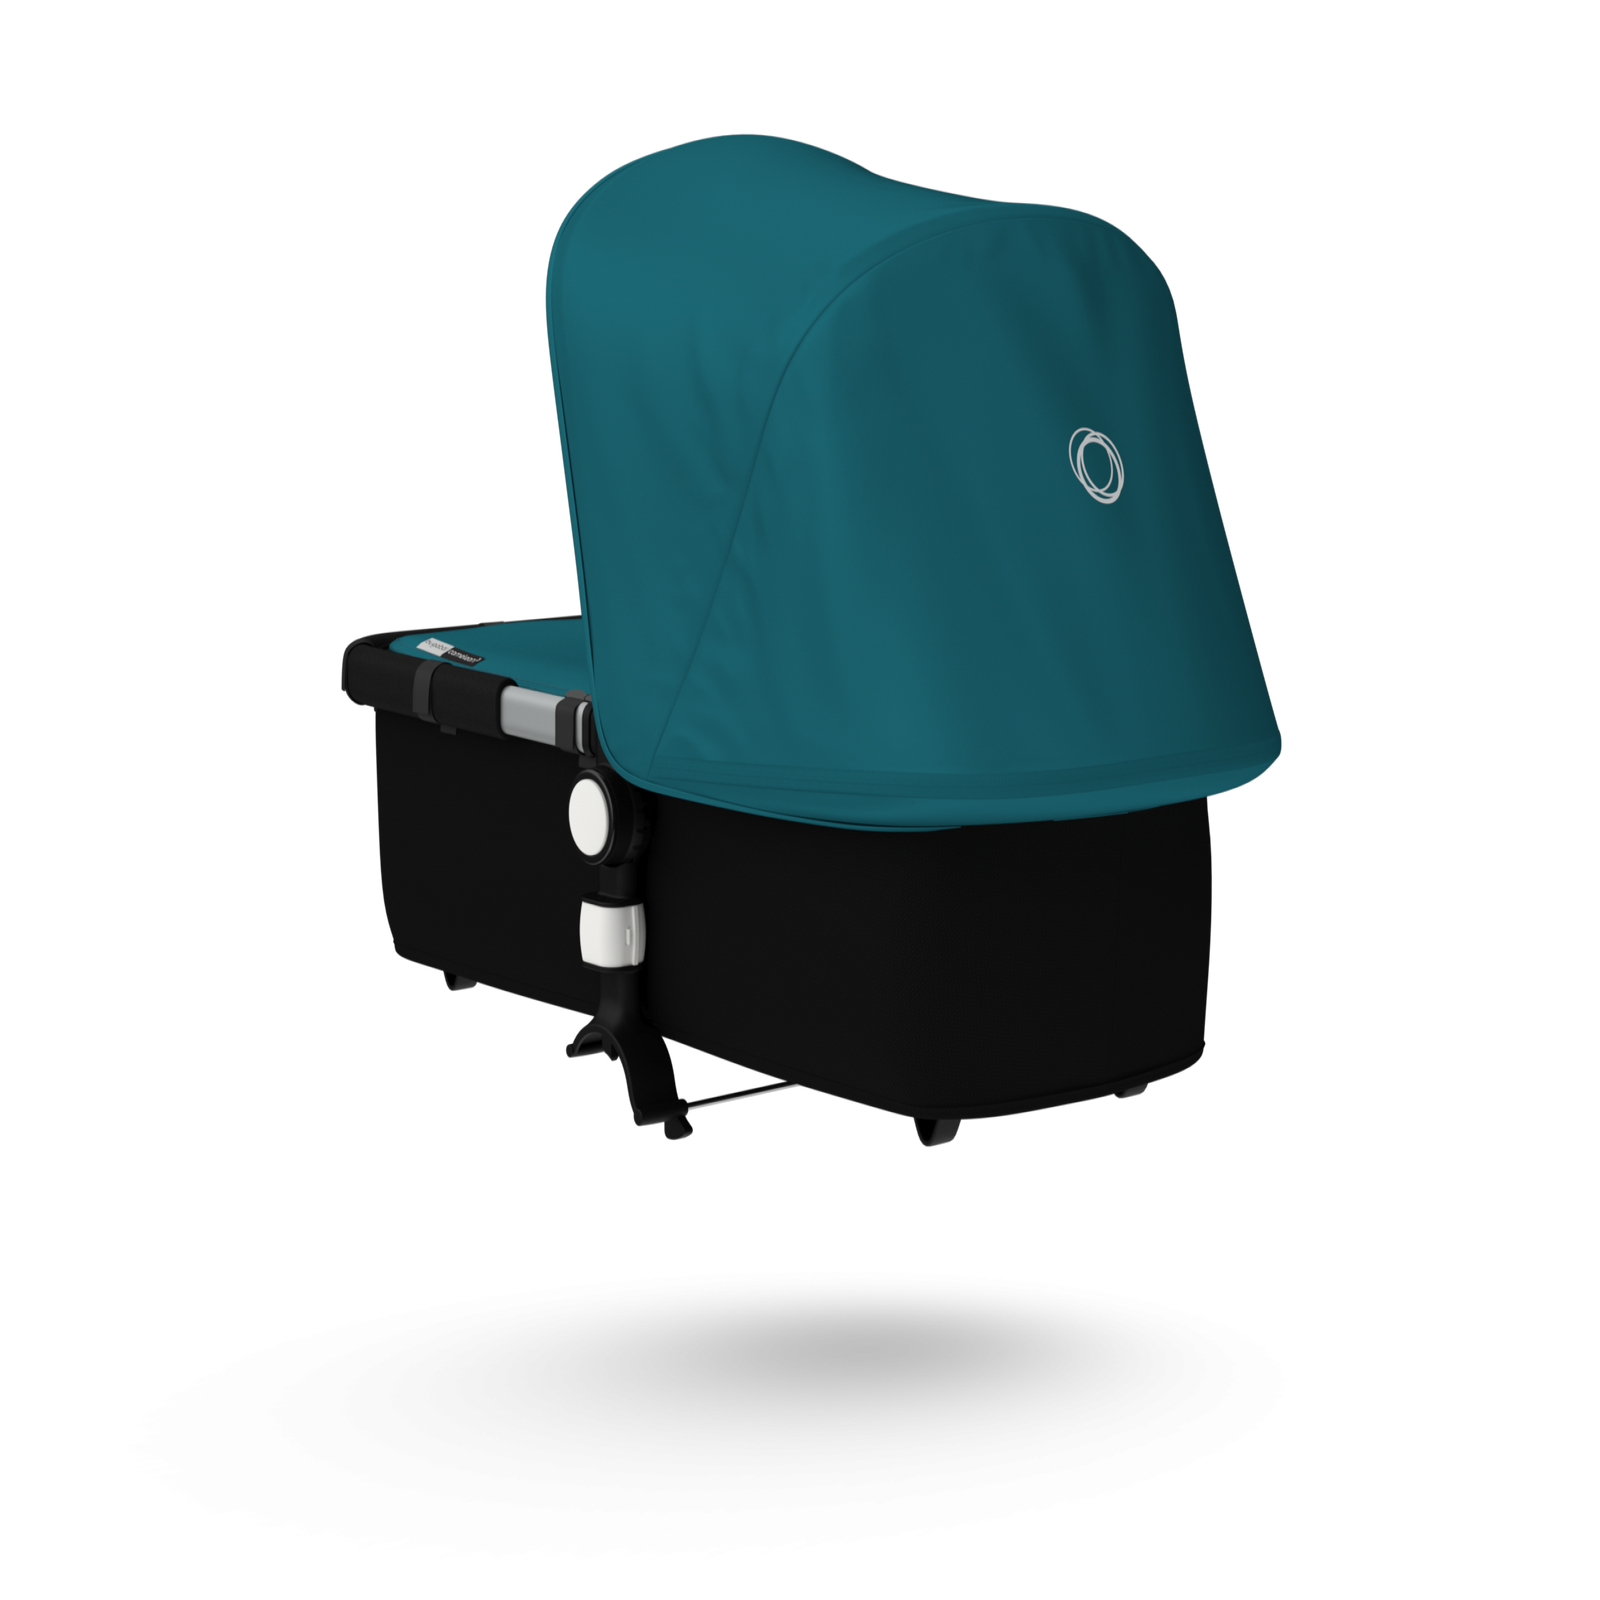 Bugaboo Cameleon3 tailored fabric set PETROL BLUE (ext)